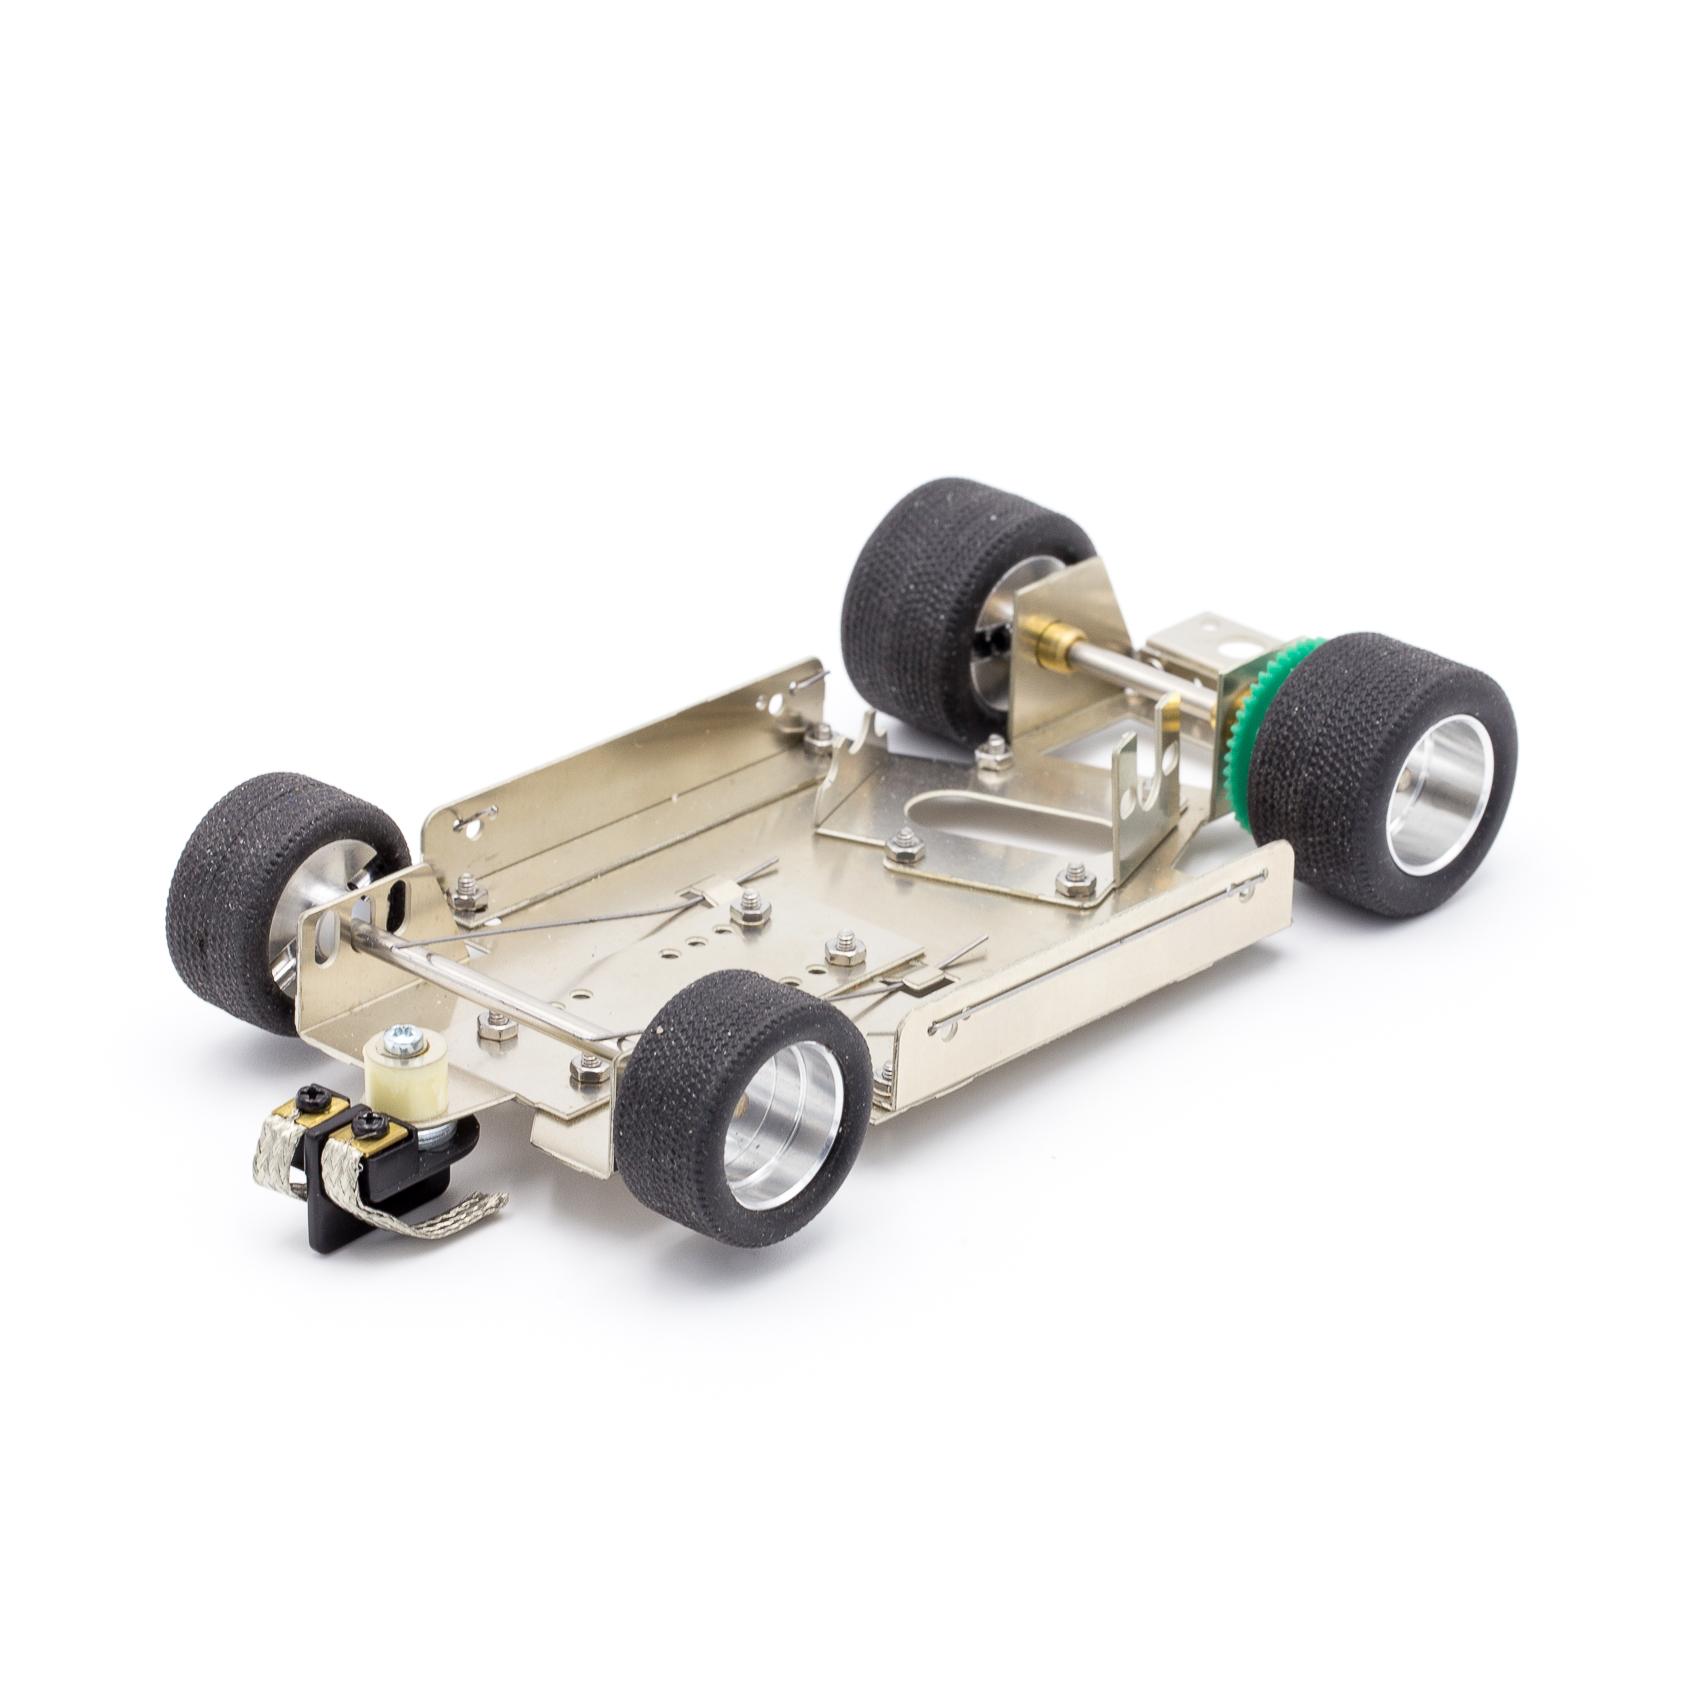 https://www.orlandinifrancesco.com/wp/wp-content/uploads/2019/06/Telaio-Slot-Car-Nurburgring-1-24-Montato-1.jpg